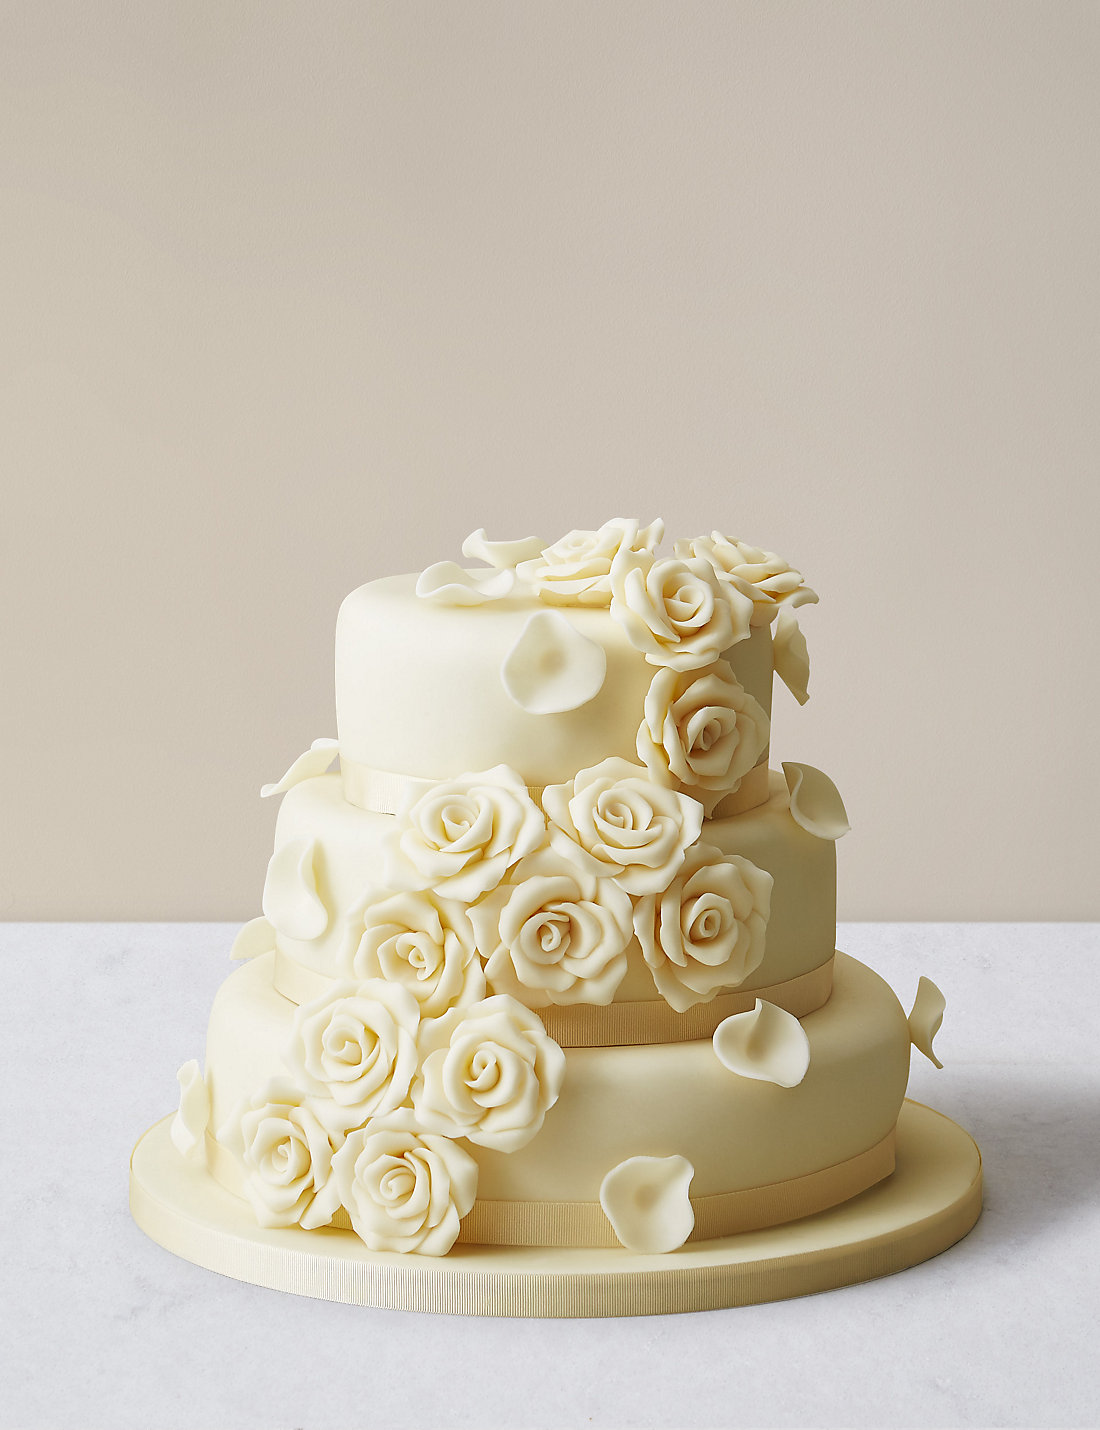 Chocolate Rose Wedding Cake 3 Tier Sponge White Icing